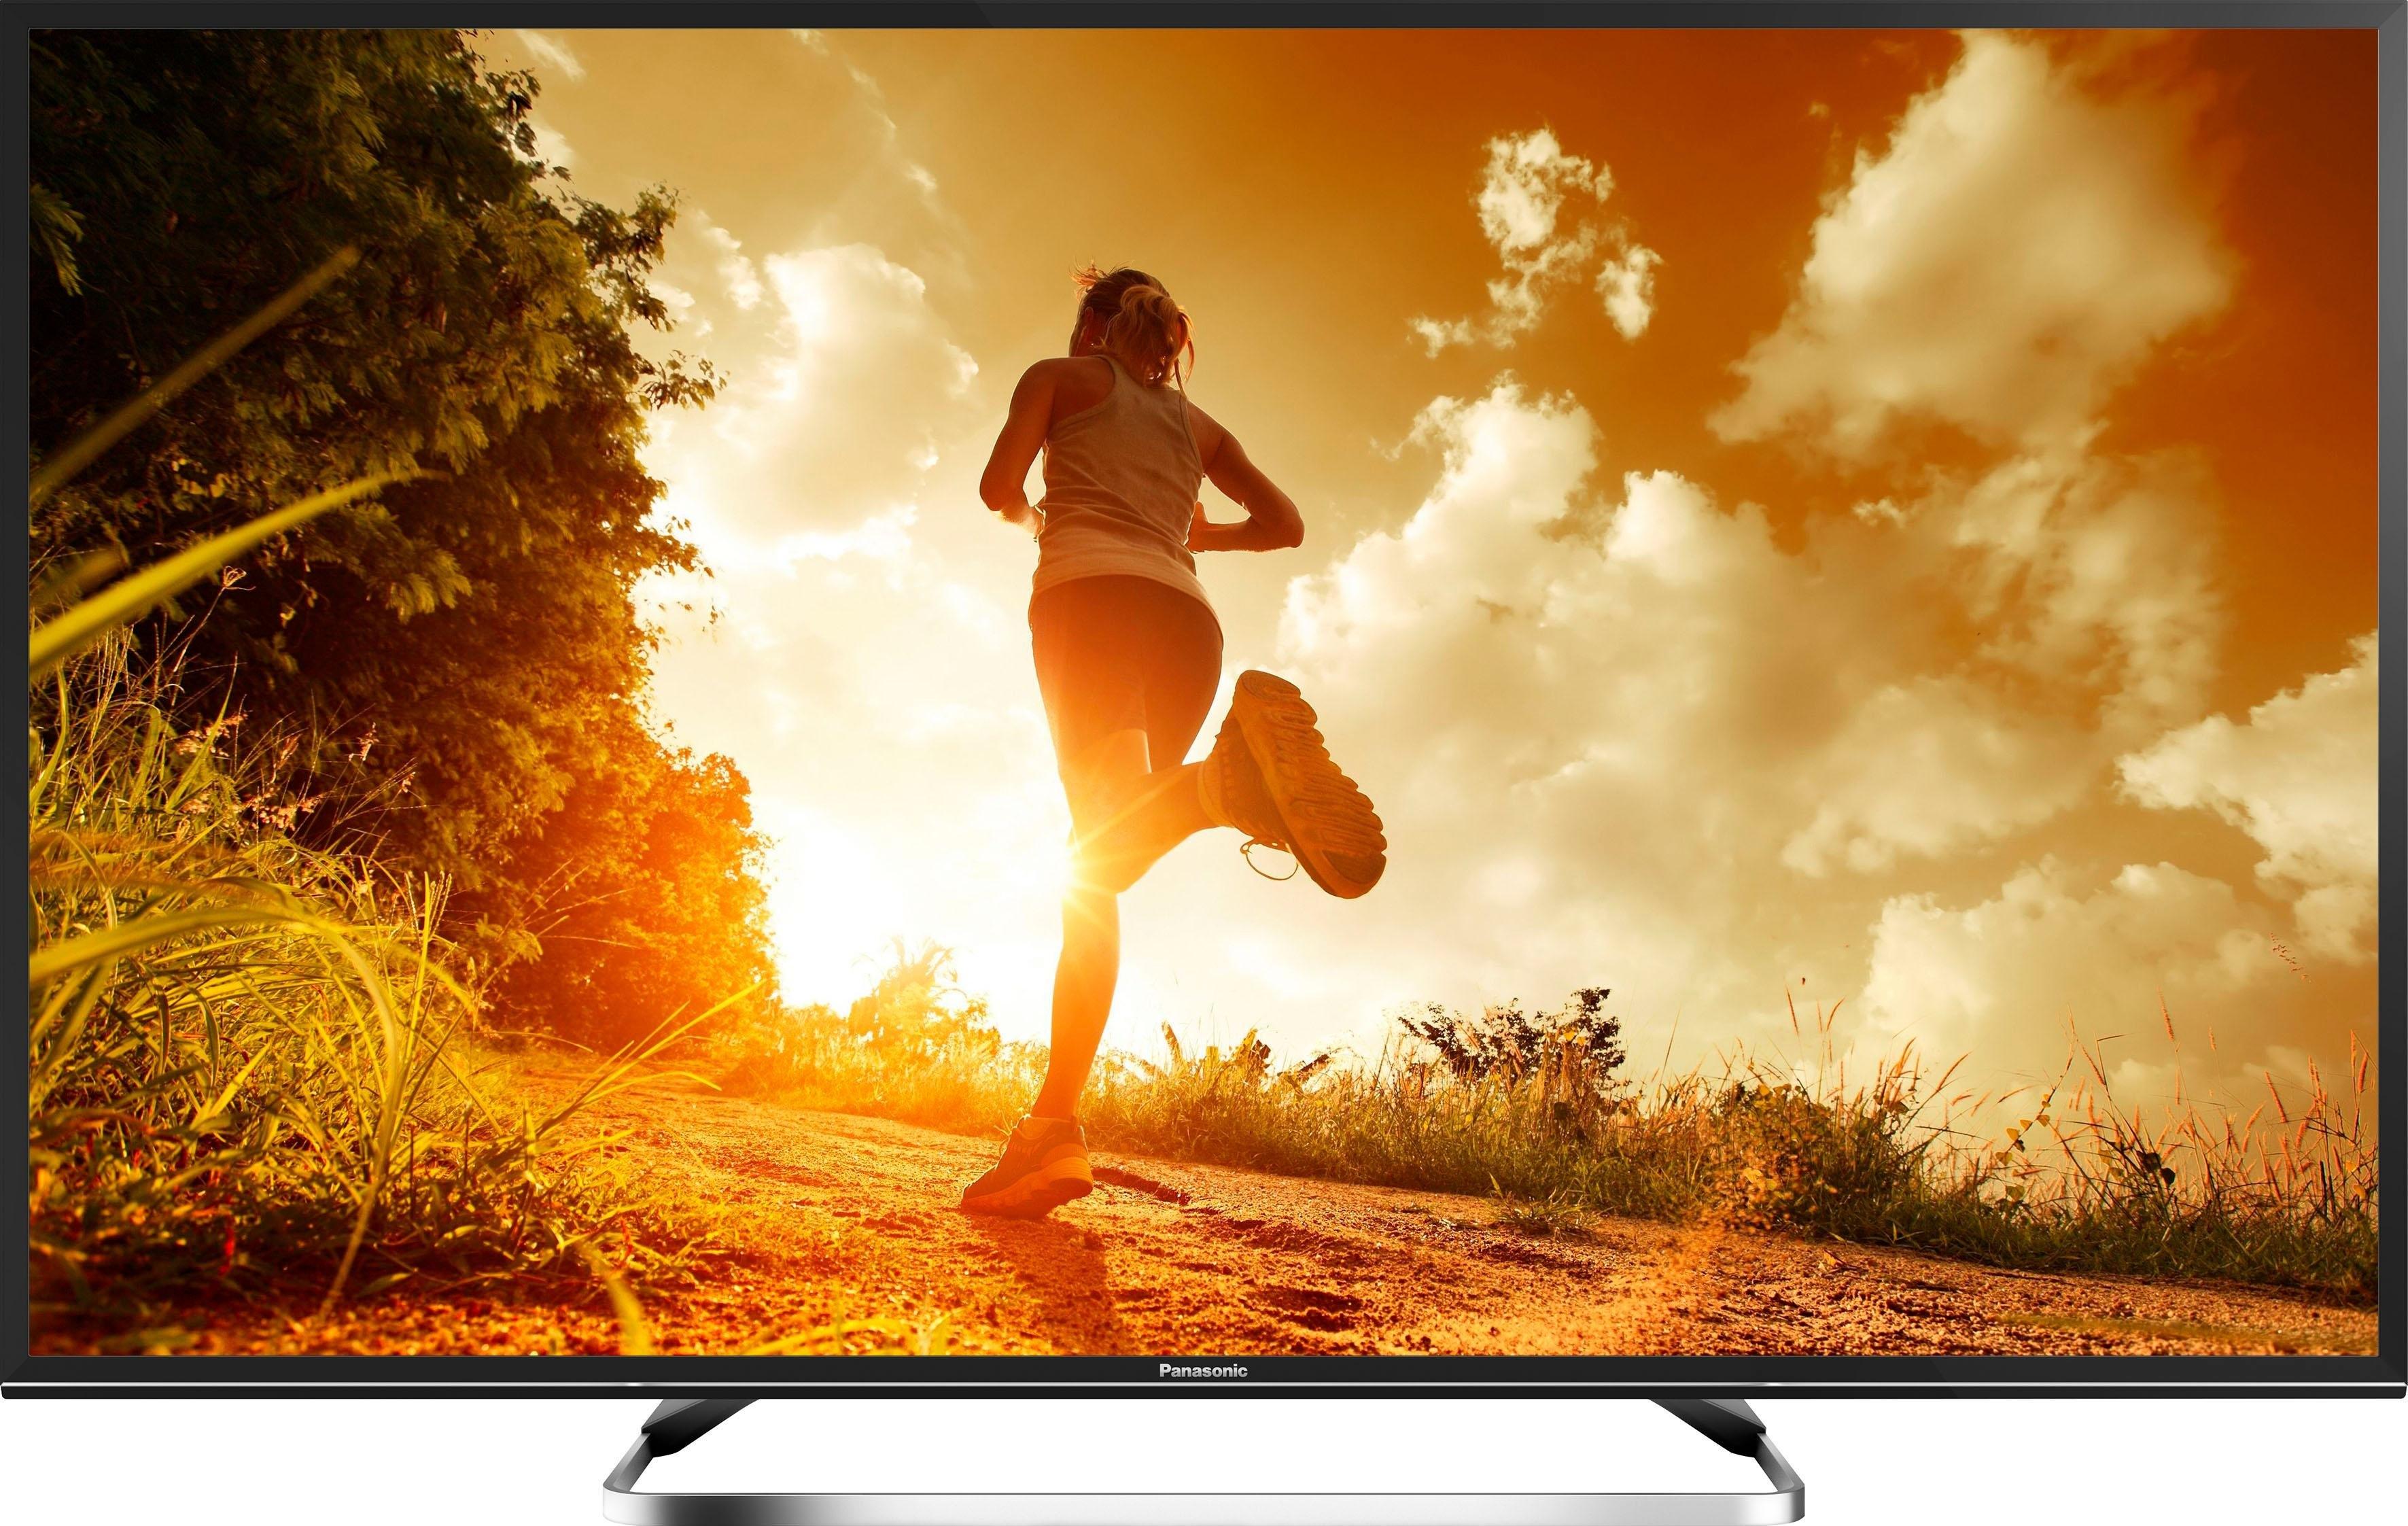 Panasonic TX-32FSW504 led-tv (32 inch), HD-ready, smart-tv voordelig en veilig online kopen